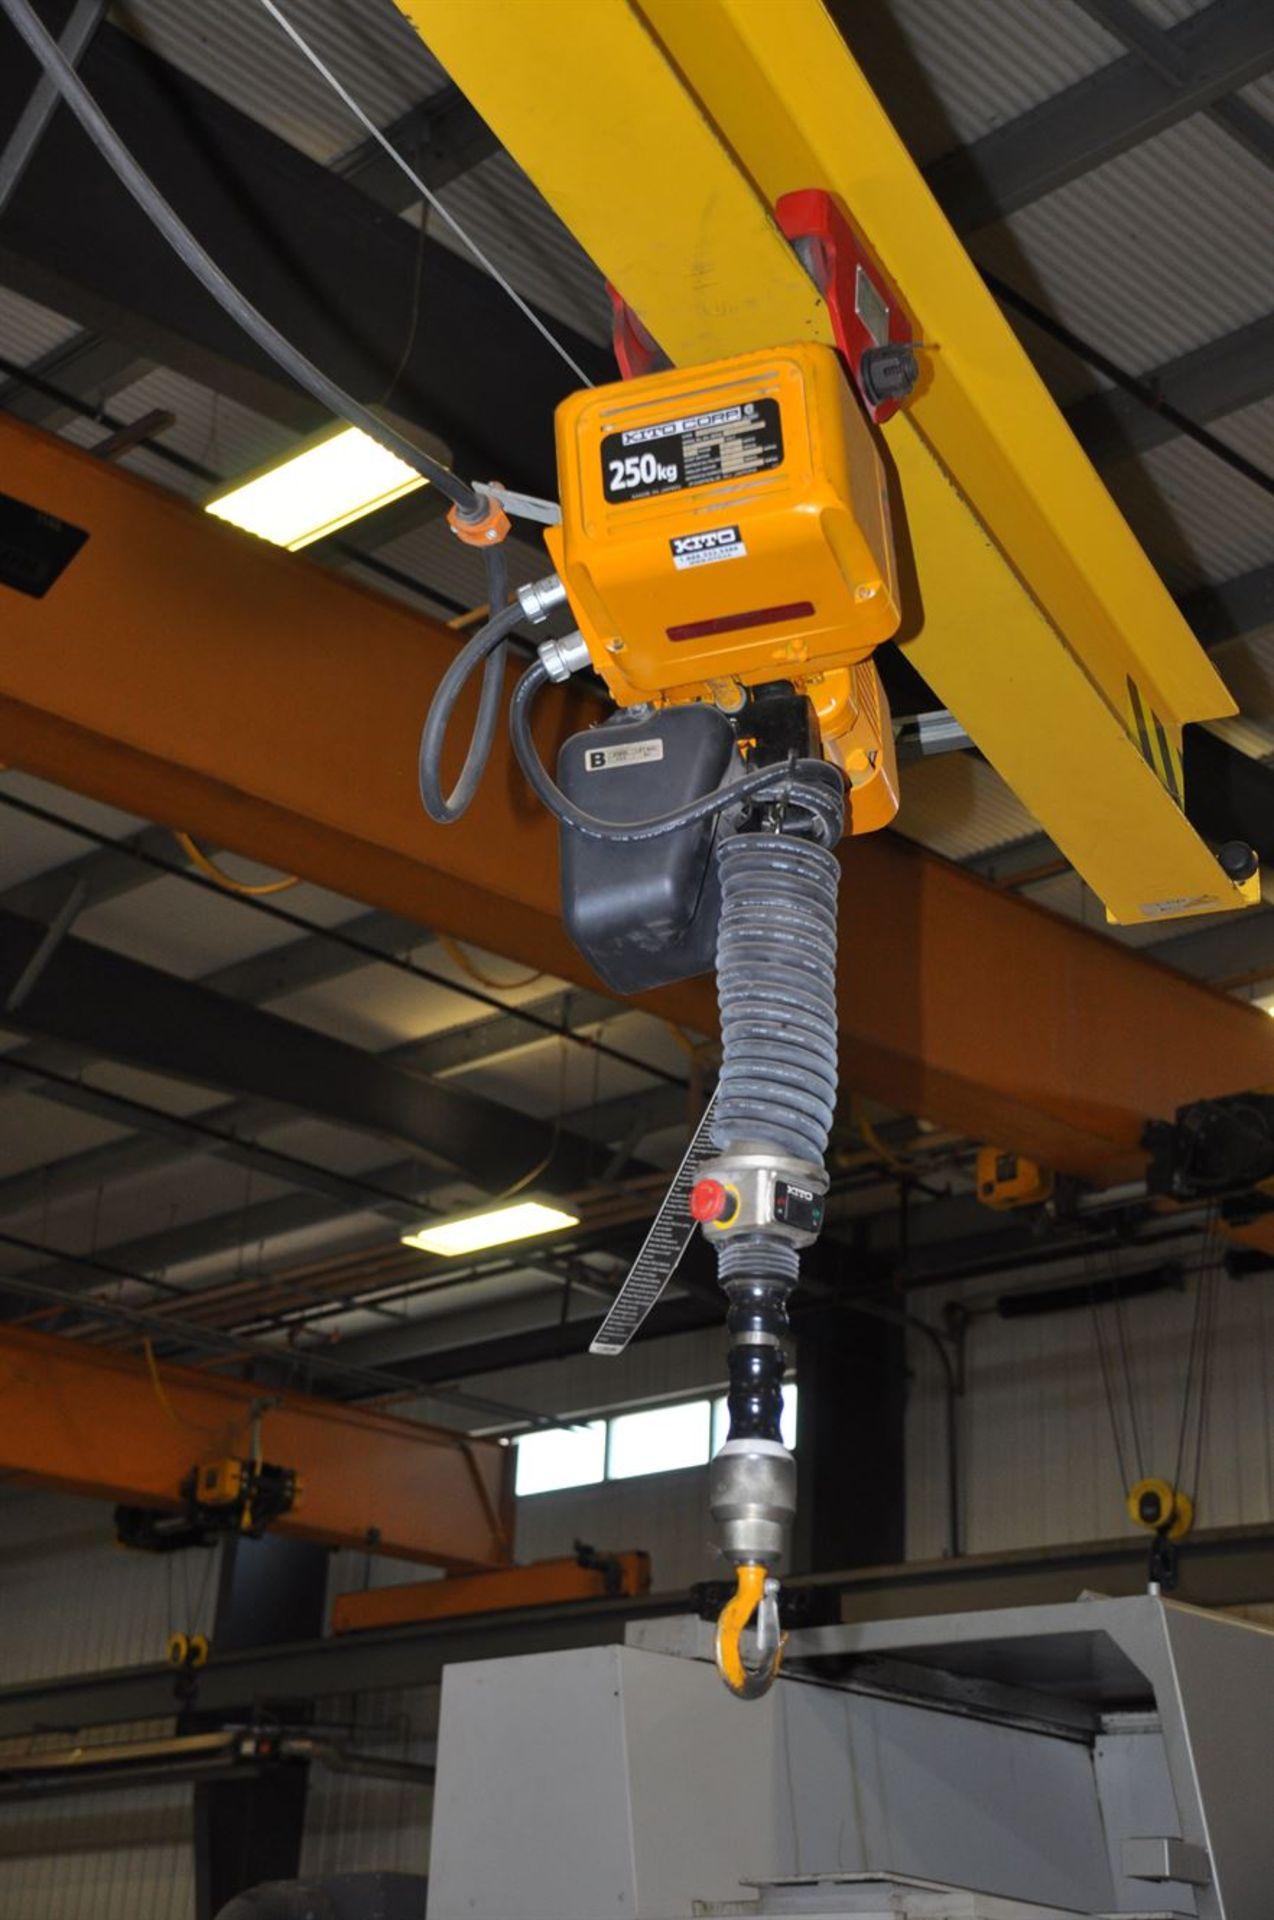 O'BRIEN 500 lb Free Standing Jib Crane, w/ KITO 250 Electric Chain Hoist